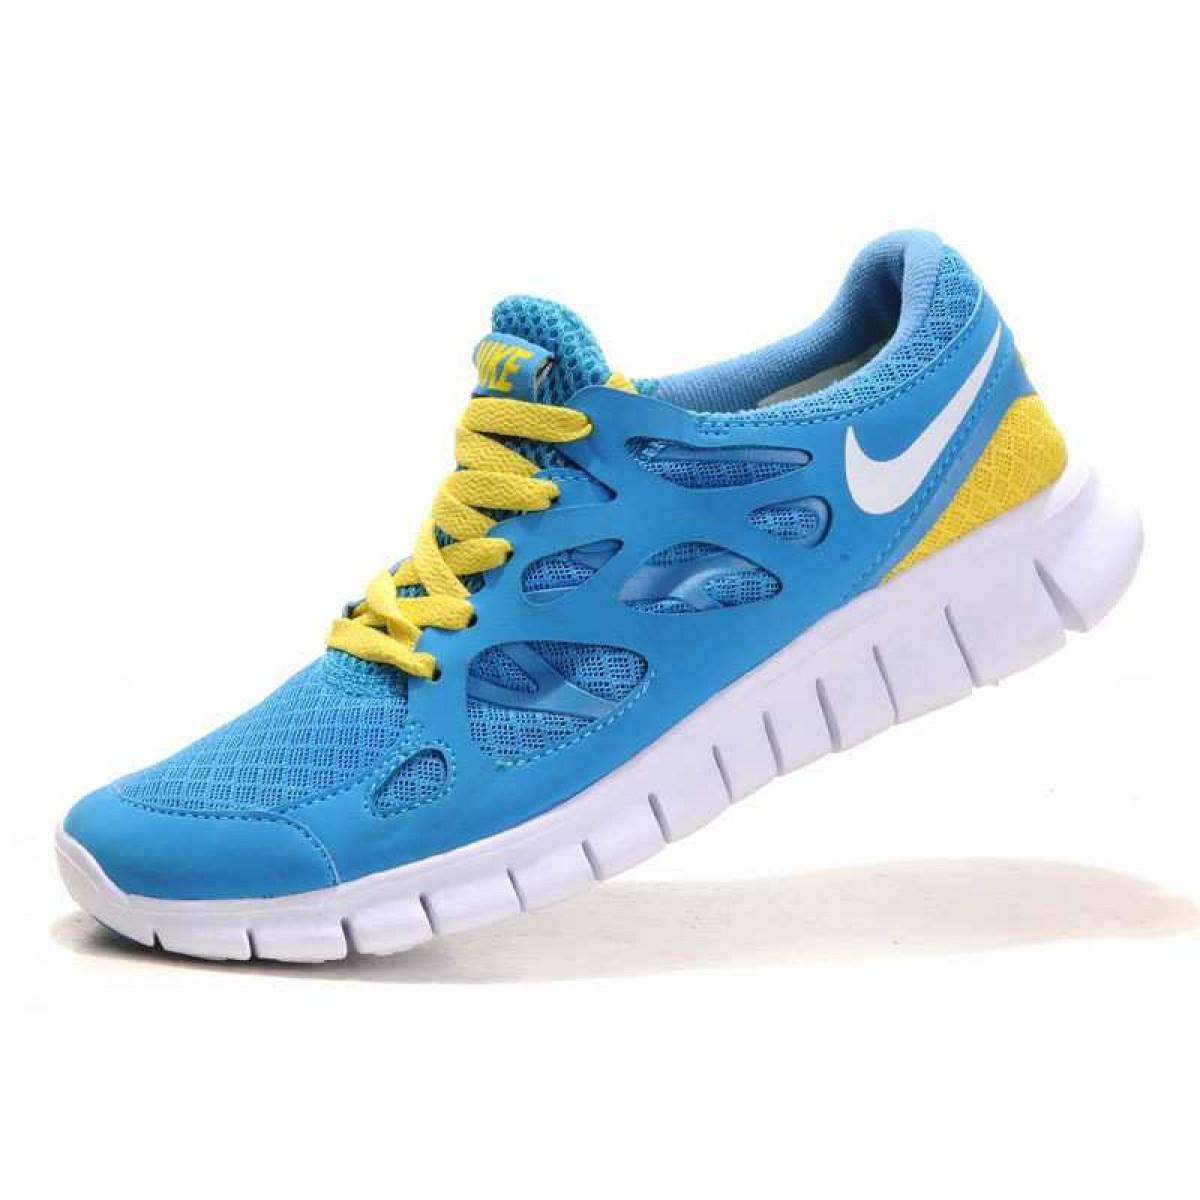 factory price 6c4fc 24d42 Nike Free Run 2 Femme Chaussures Bleu Jaune,nike free chaussure  online,Large choix